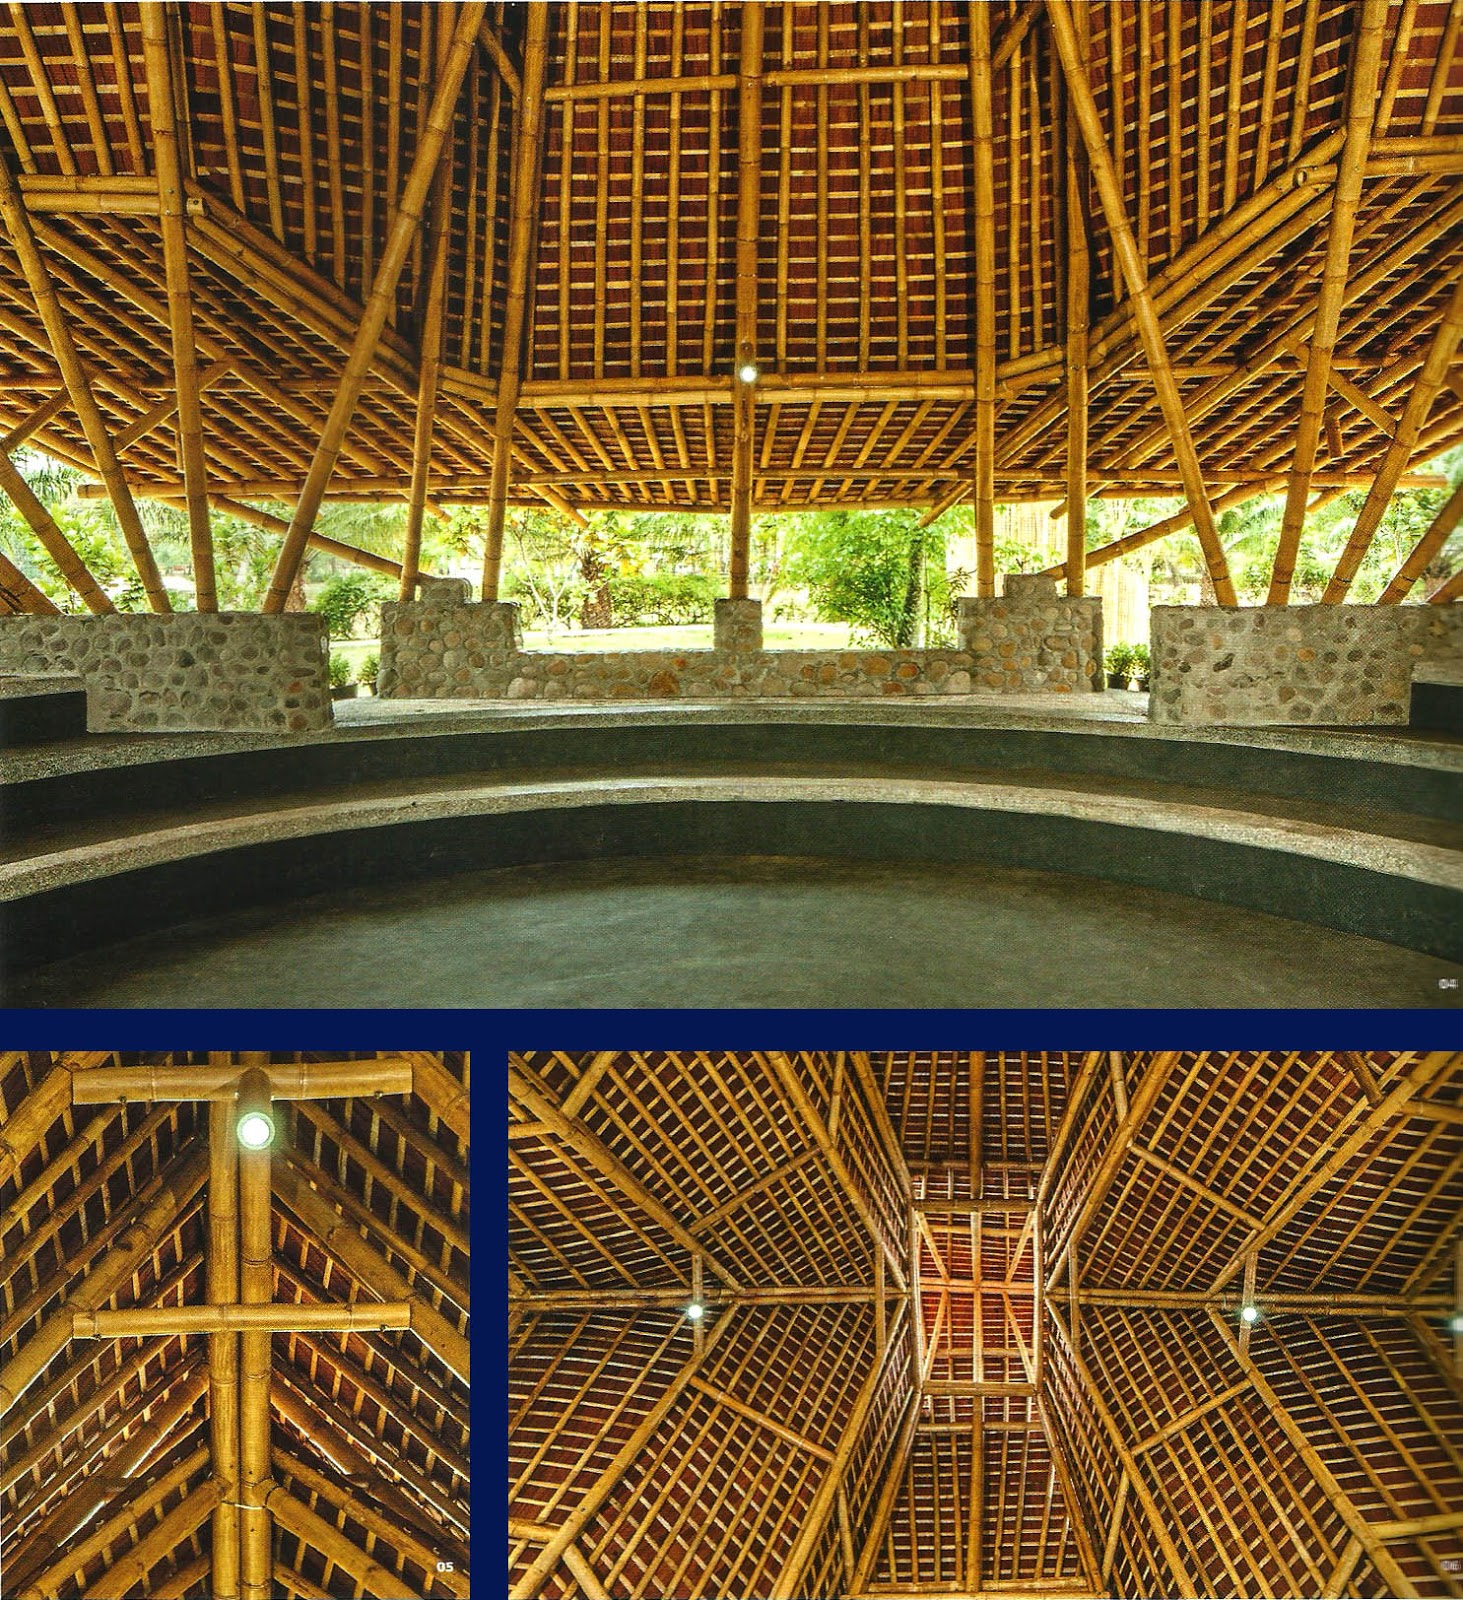 Atraksi Seni Dalam Ruang Bambu